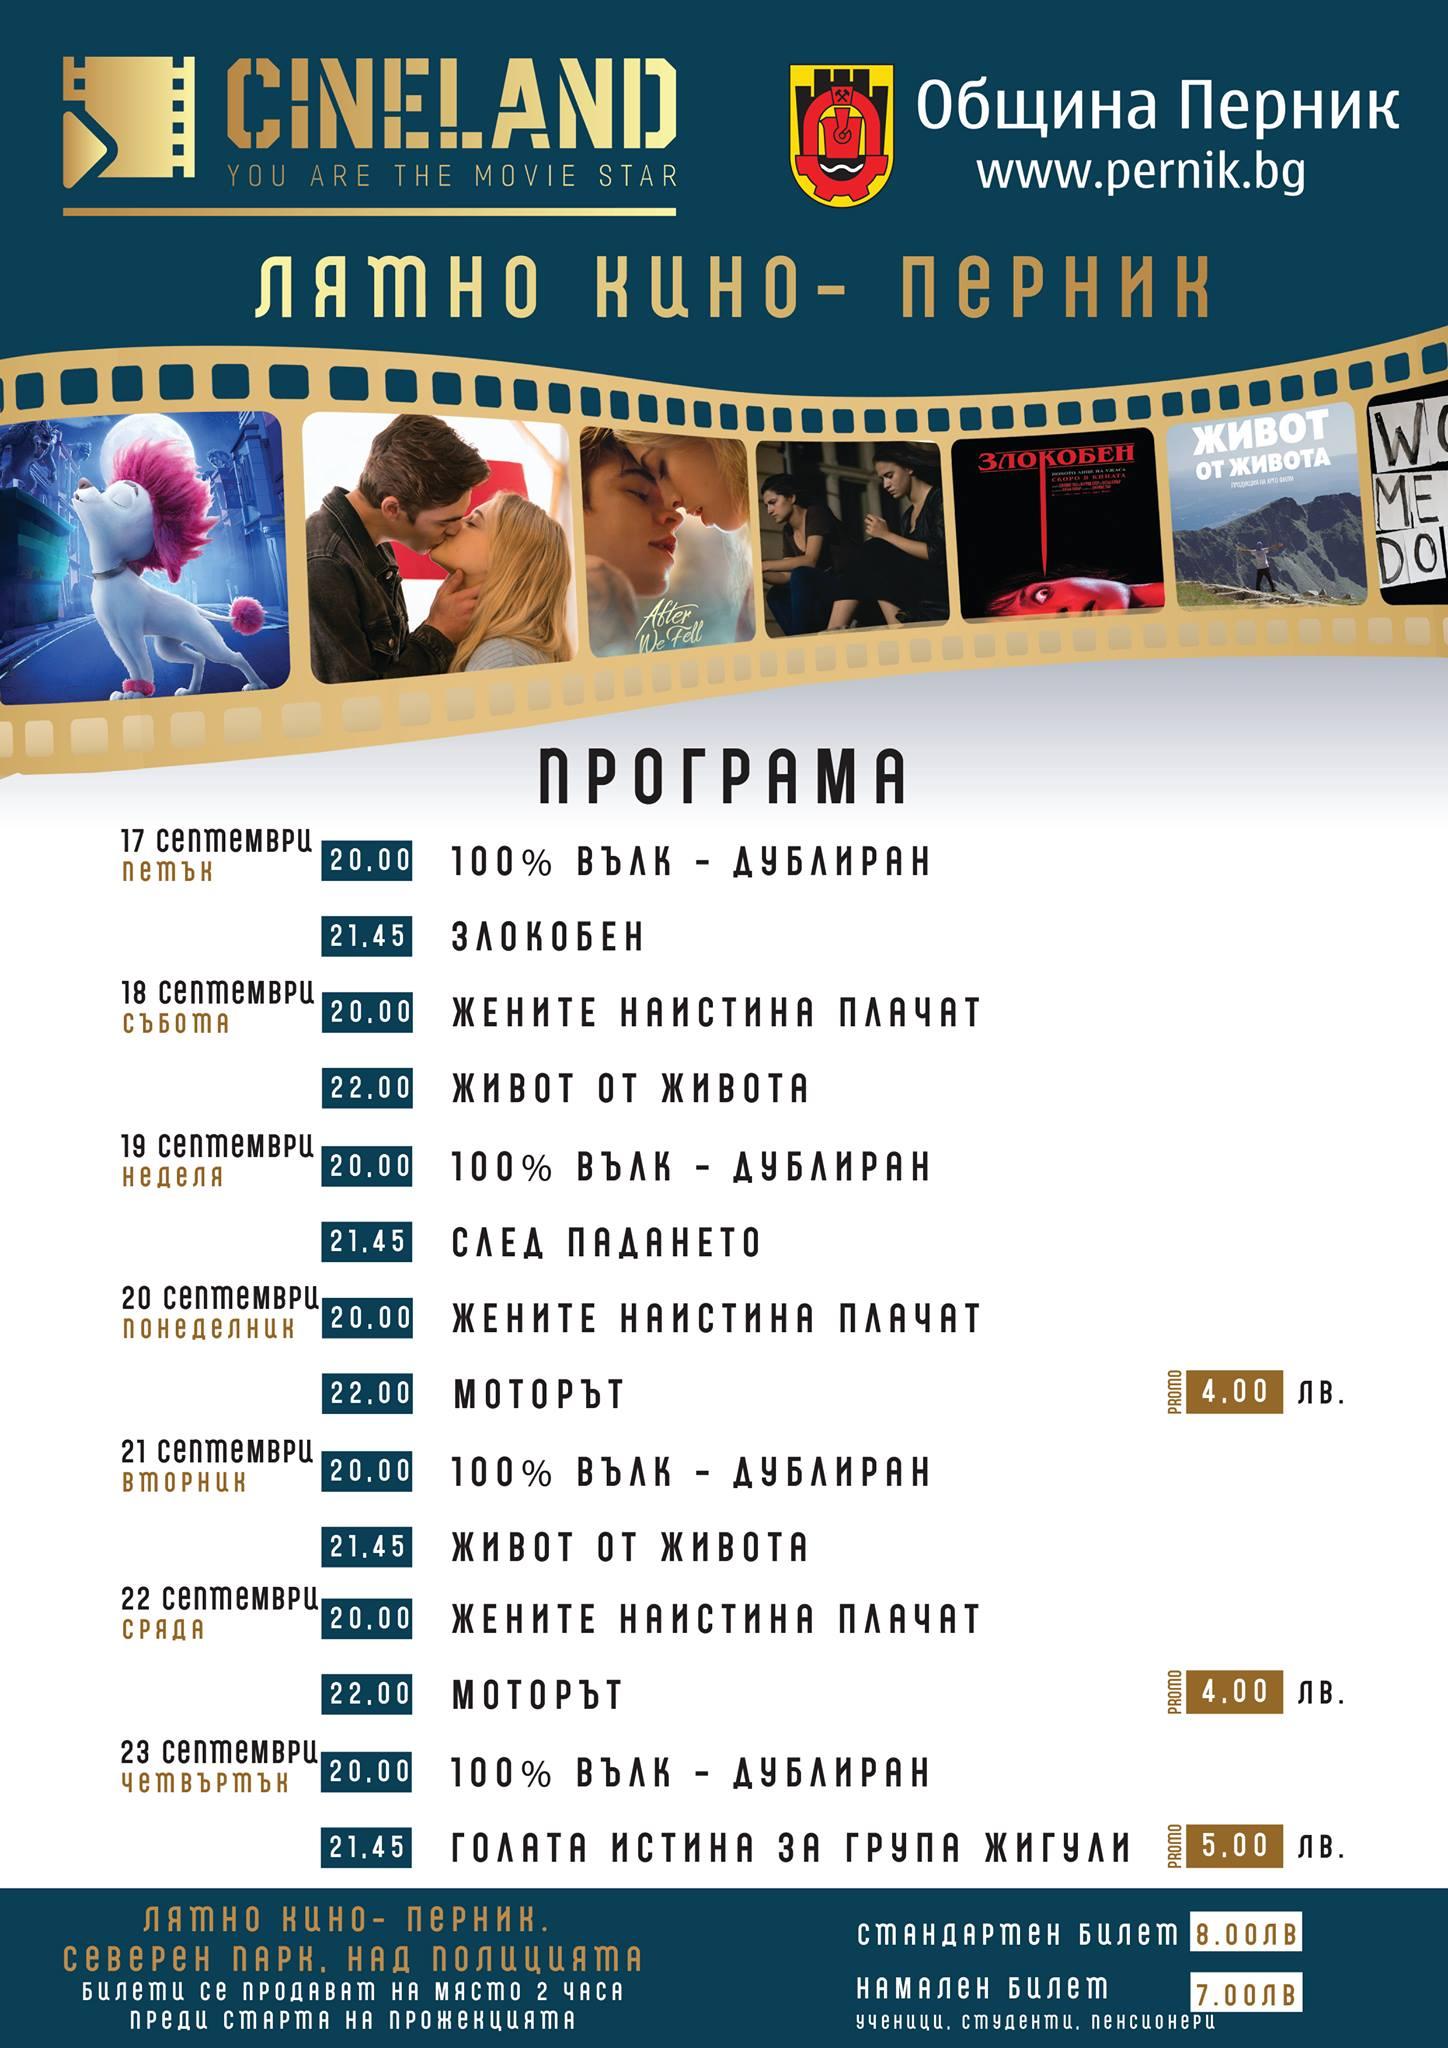 CineLand Перник: Кино програма - 17-23 септември 2021